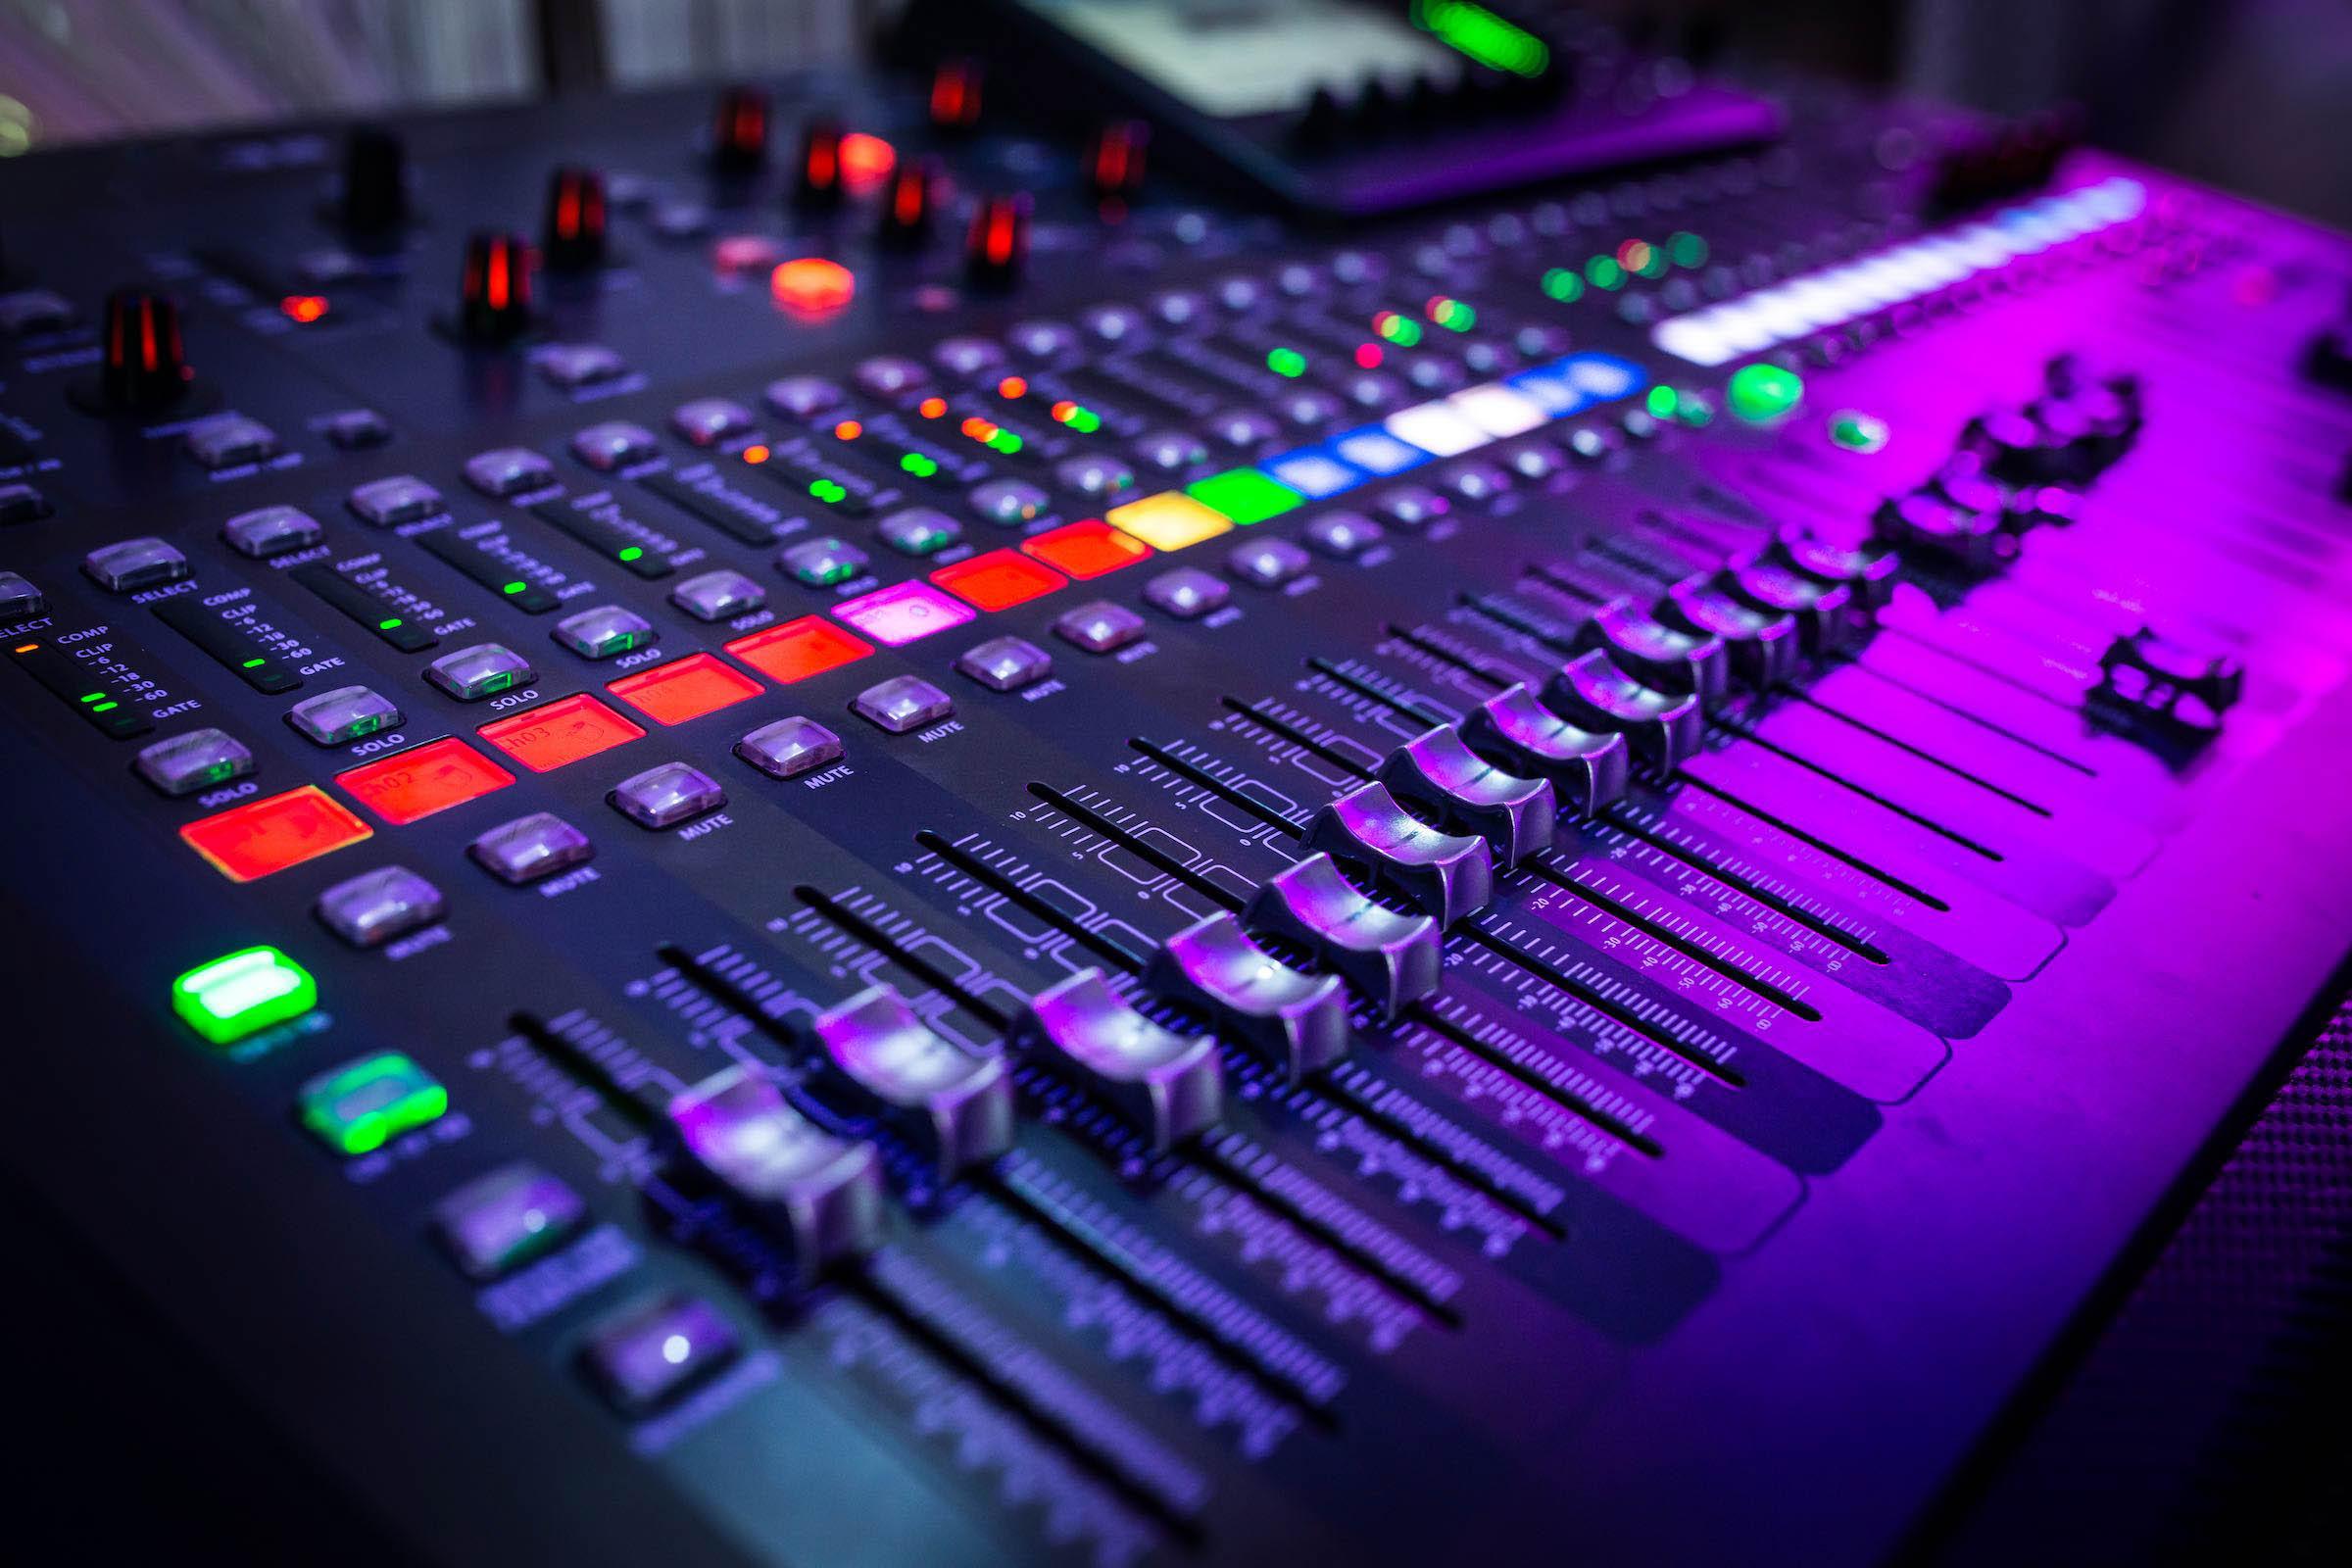 Tontechnik | Lautsprecher | Mischpulte | Beschallung | Mieten | Hannover | Lehmann | Eventservice